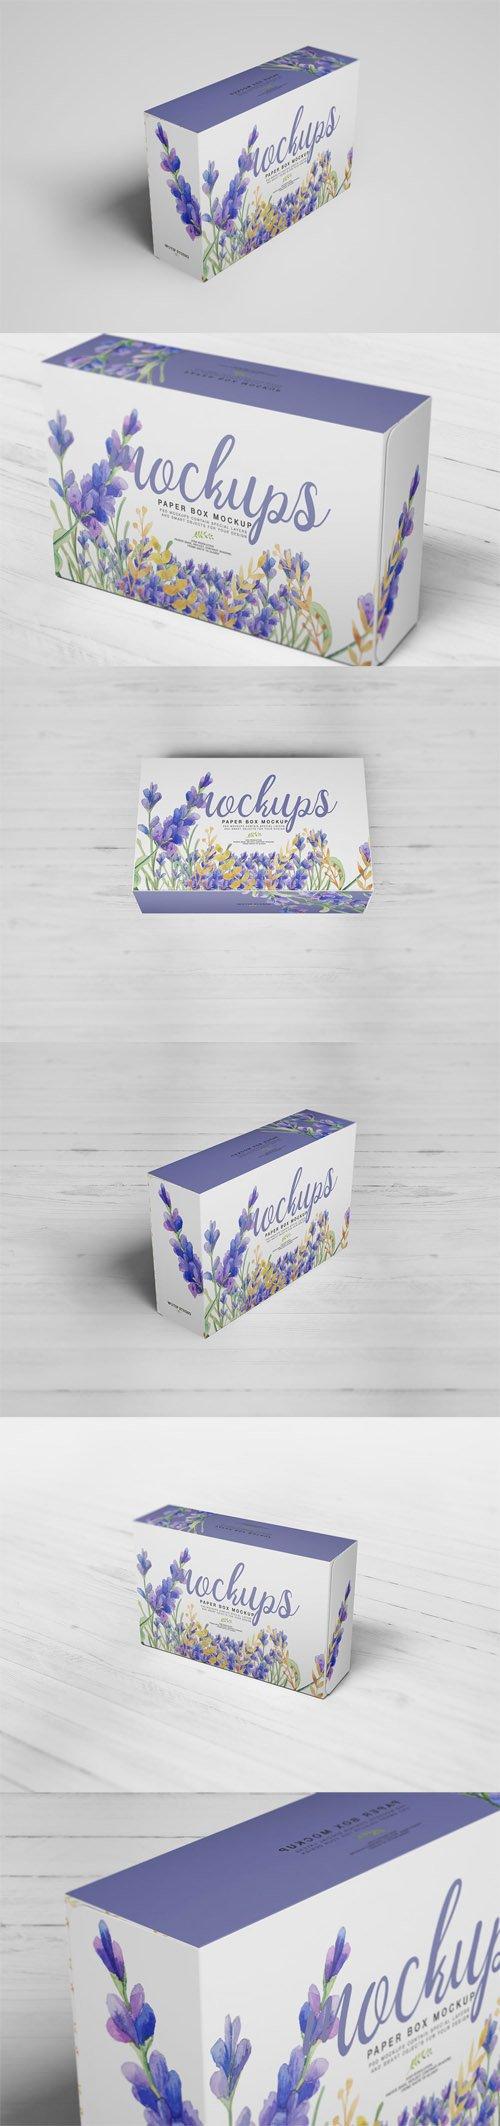 Paper Box Mockup 06